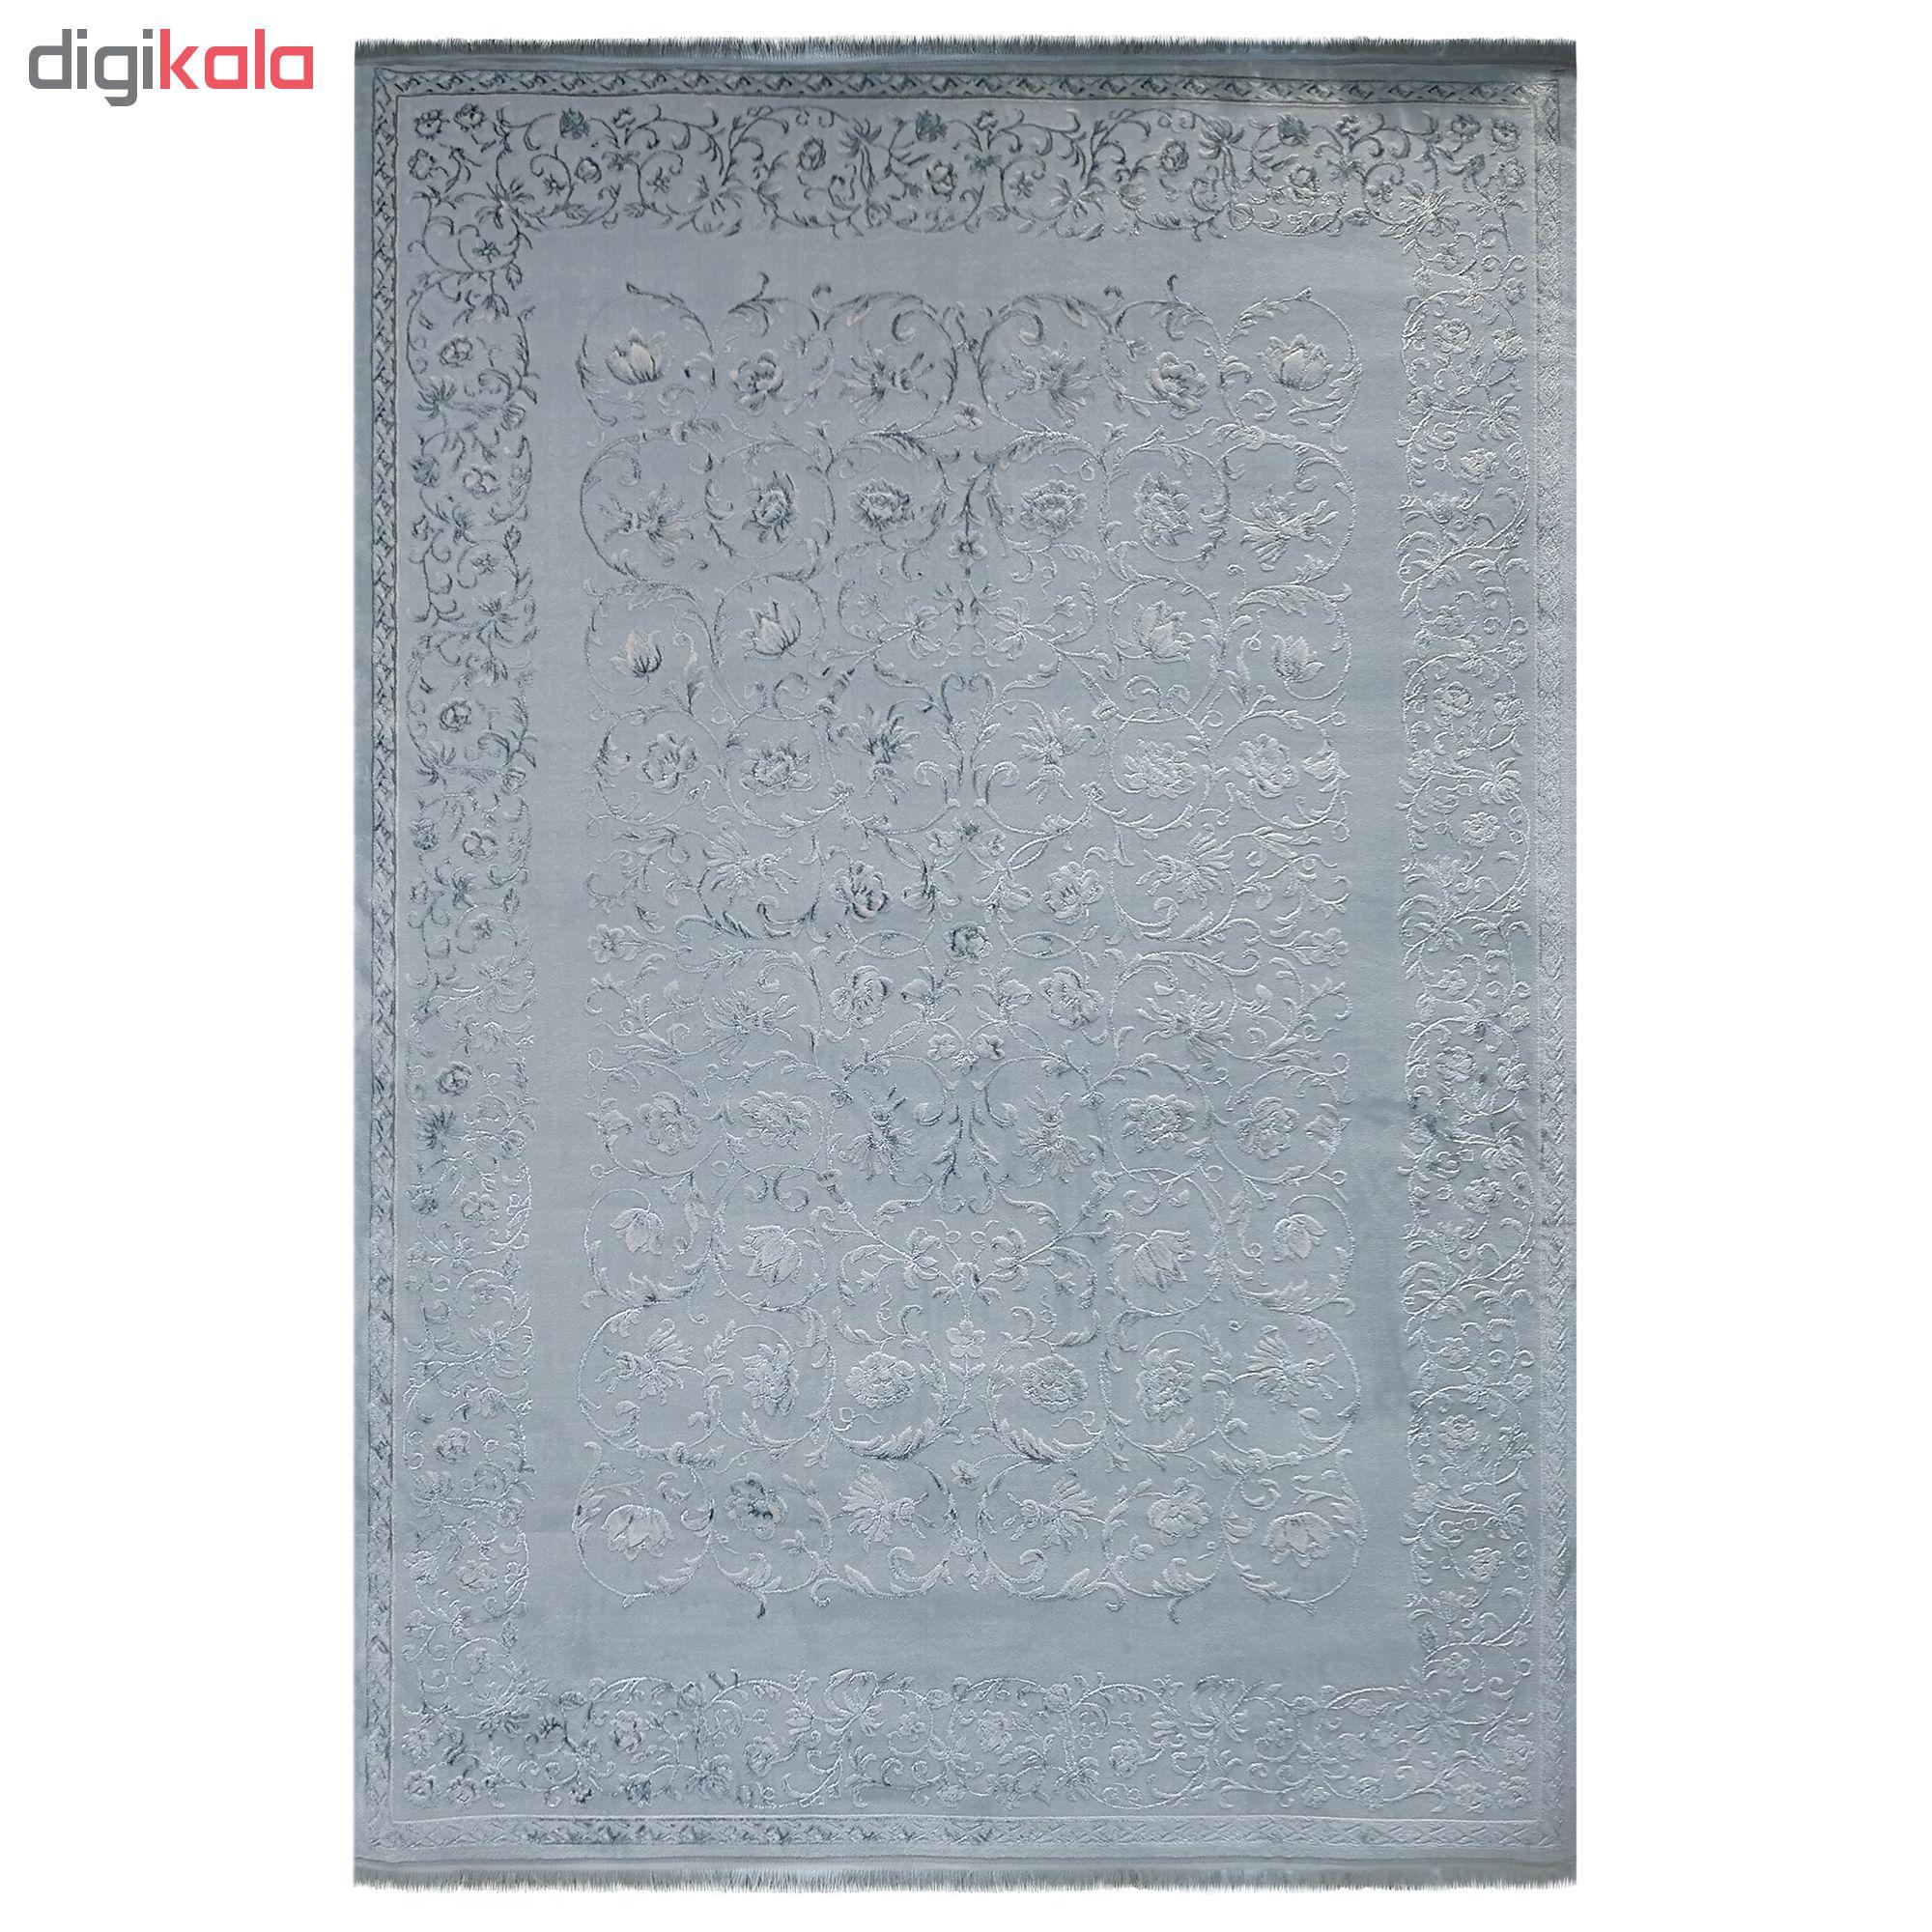 فرش ماشینی زمرد مشهد کد DI02 زمینه سبز آبی